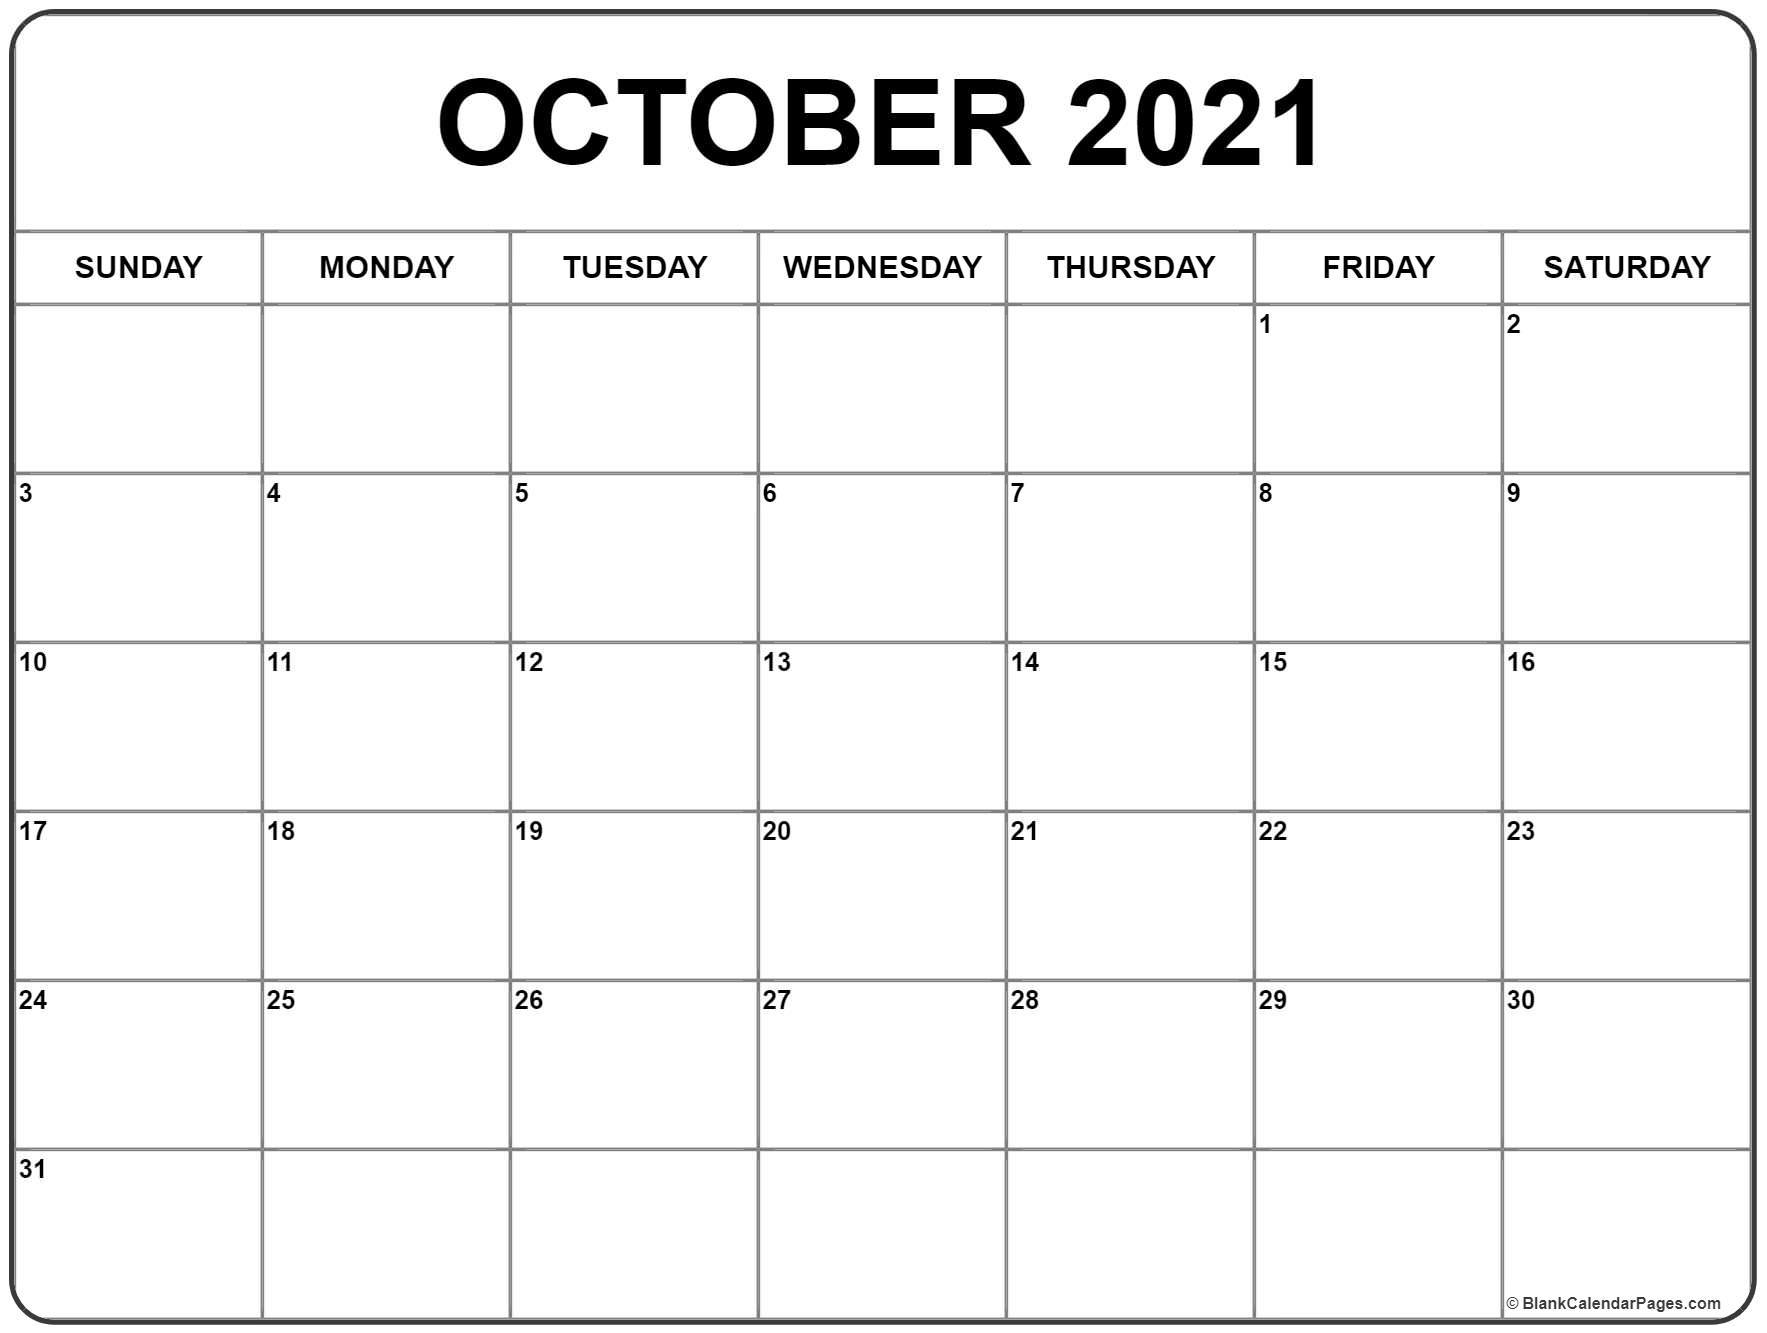 Get Aug To Oct Calendars 2021